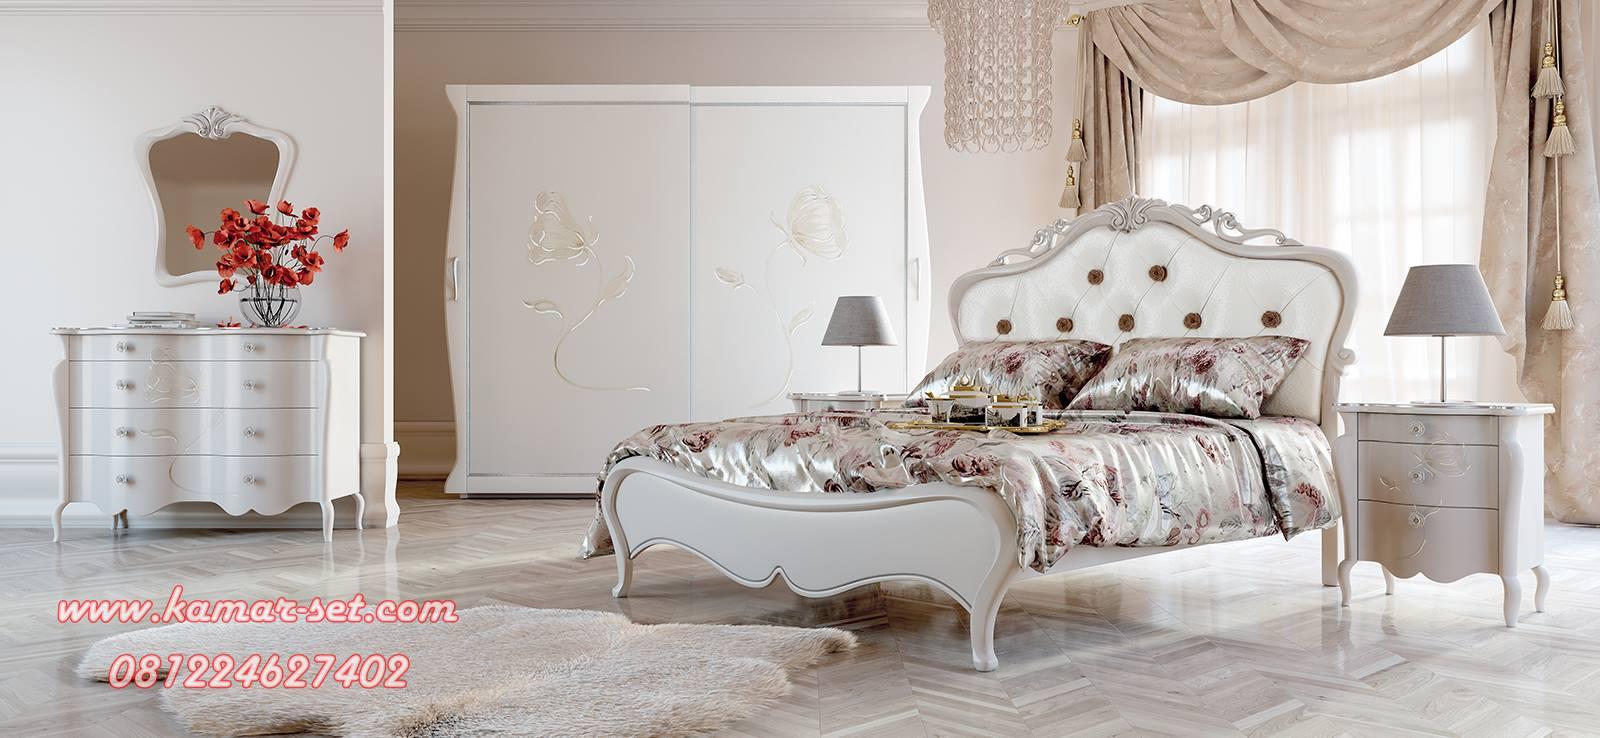 Set Kamar Tidur Romantis Klasik Mewah KSK-55